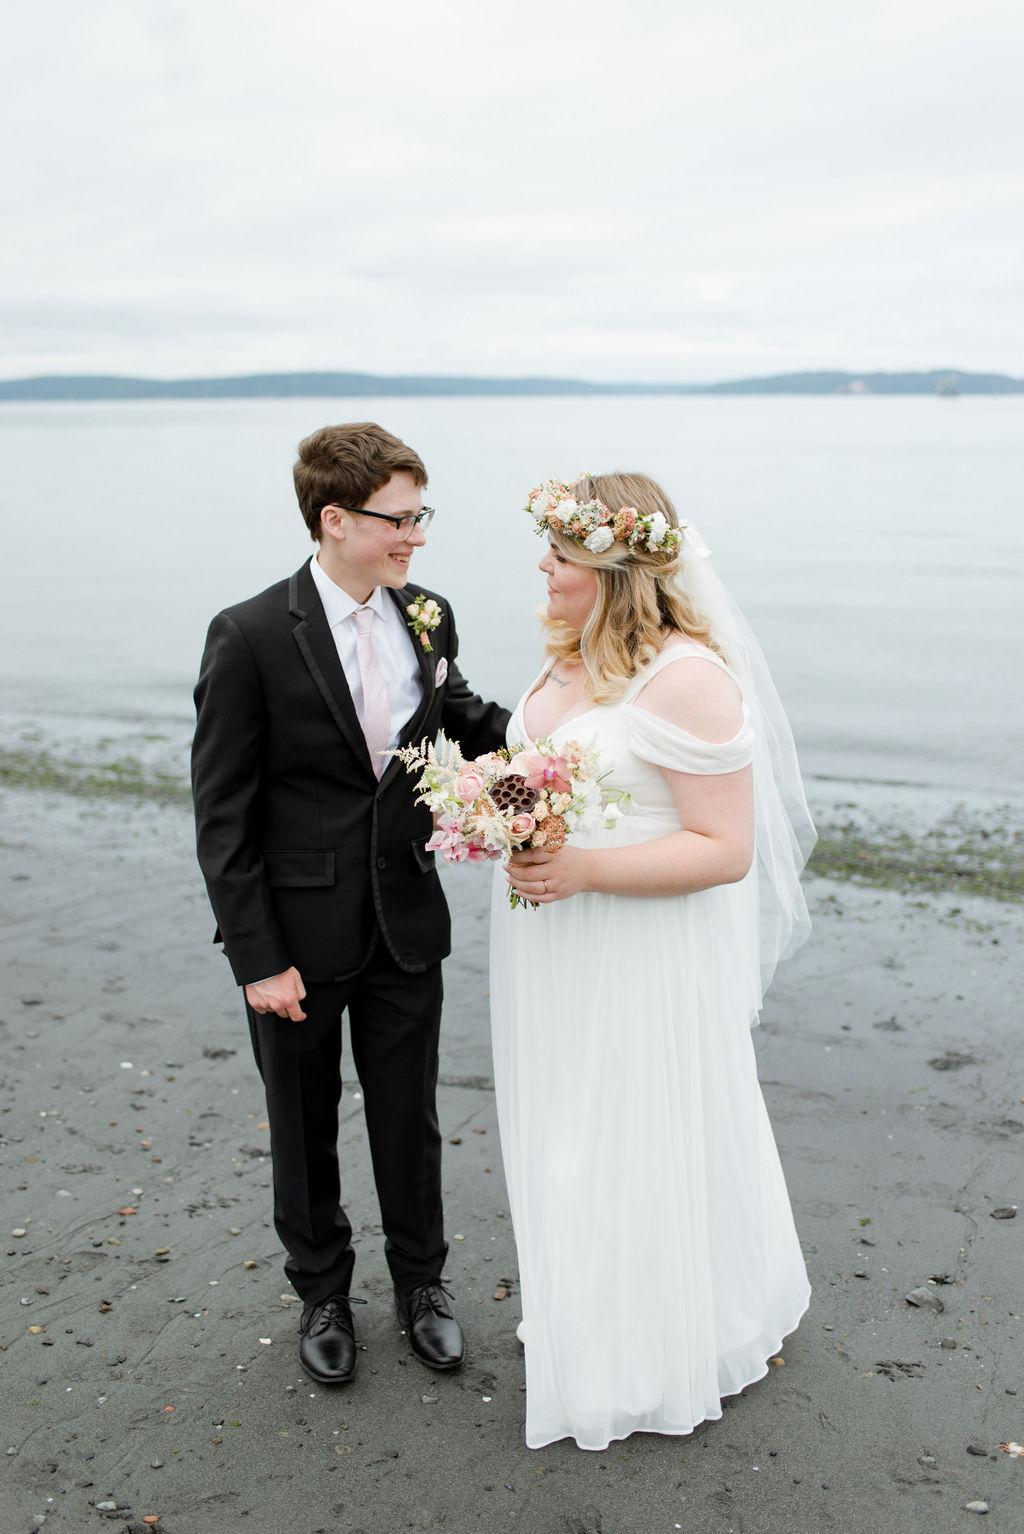 Wedding photos at Ruston Way